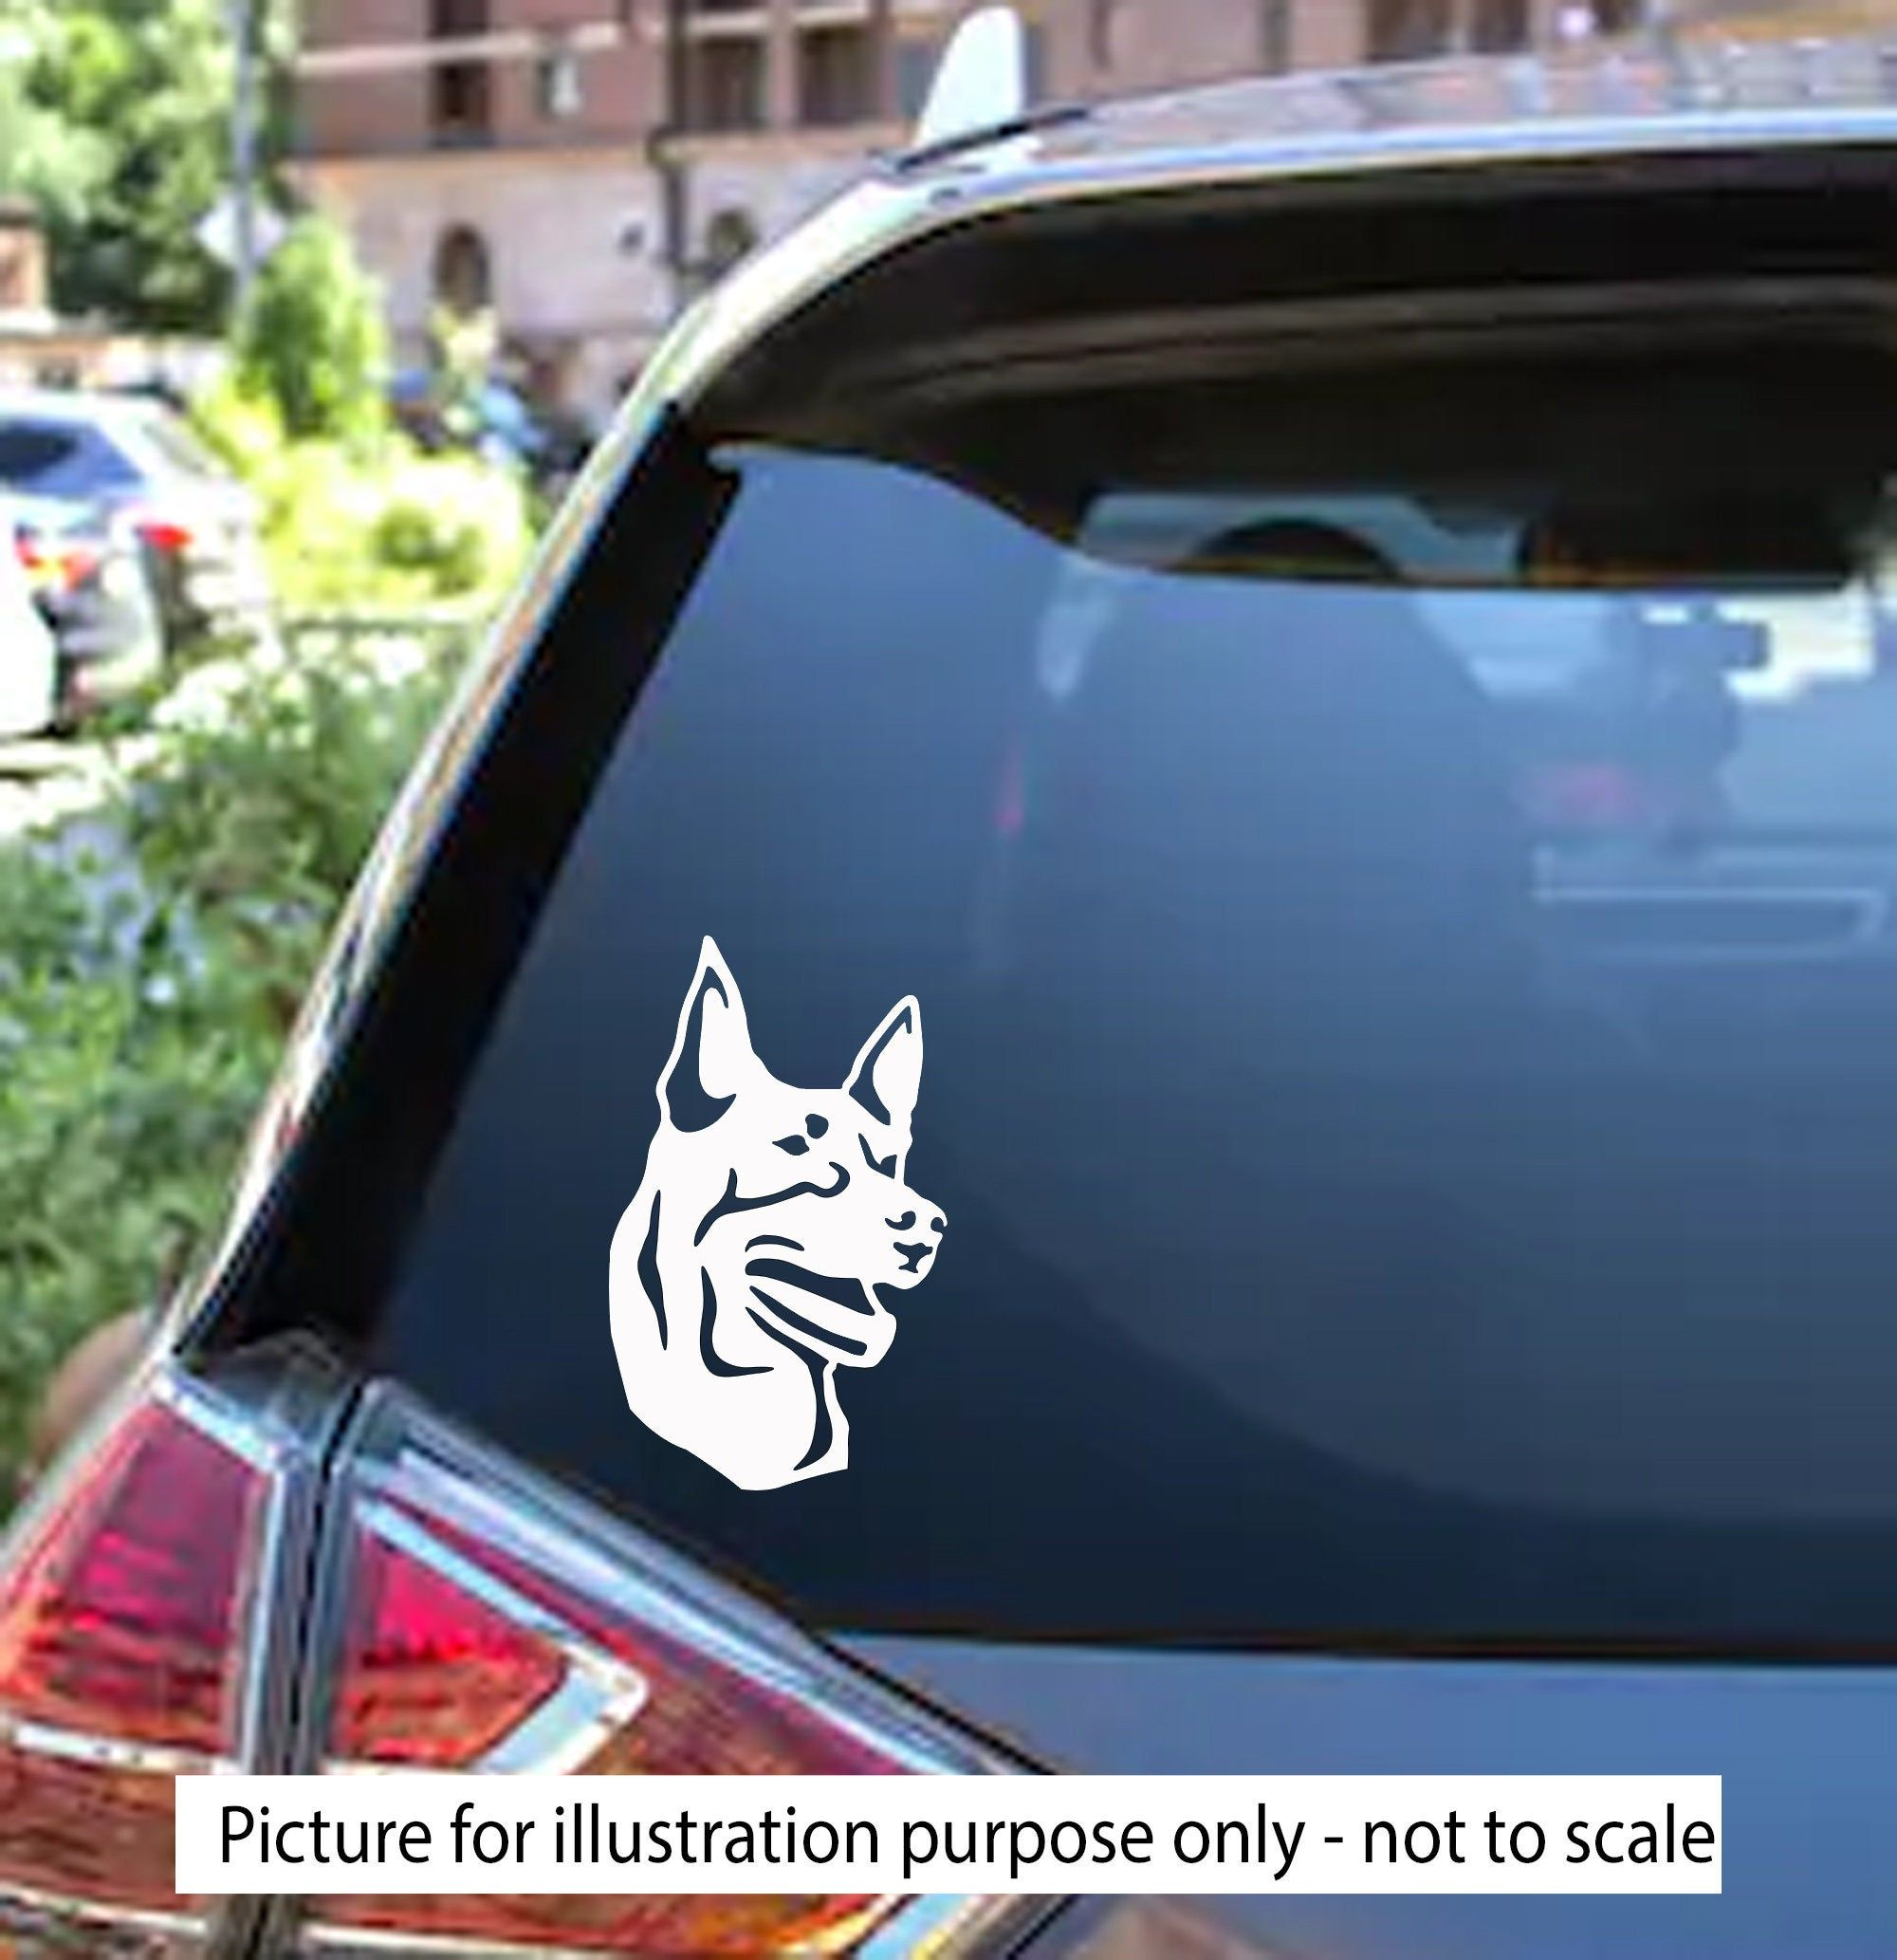 Kelpie Dog Decal Car Window Sticker Dog Decal Vinyl Decal Sticker Laptop Glass Phone Australian Kel Dog Decals Dog Decals Car Car Window Stickers [ 2066 x 2000 Pixel ]